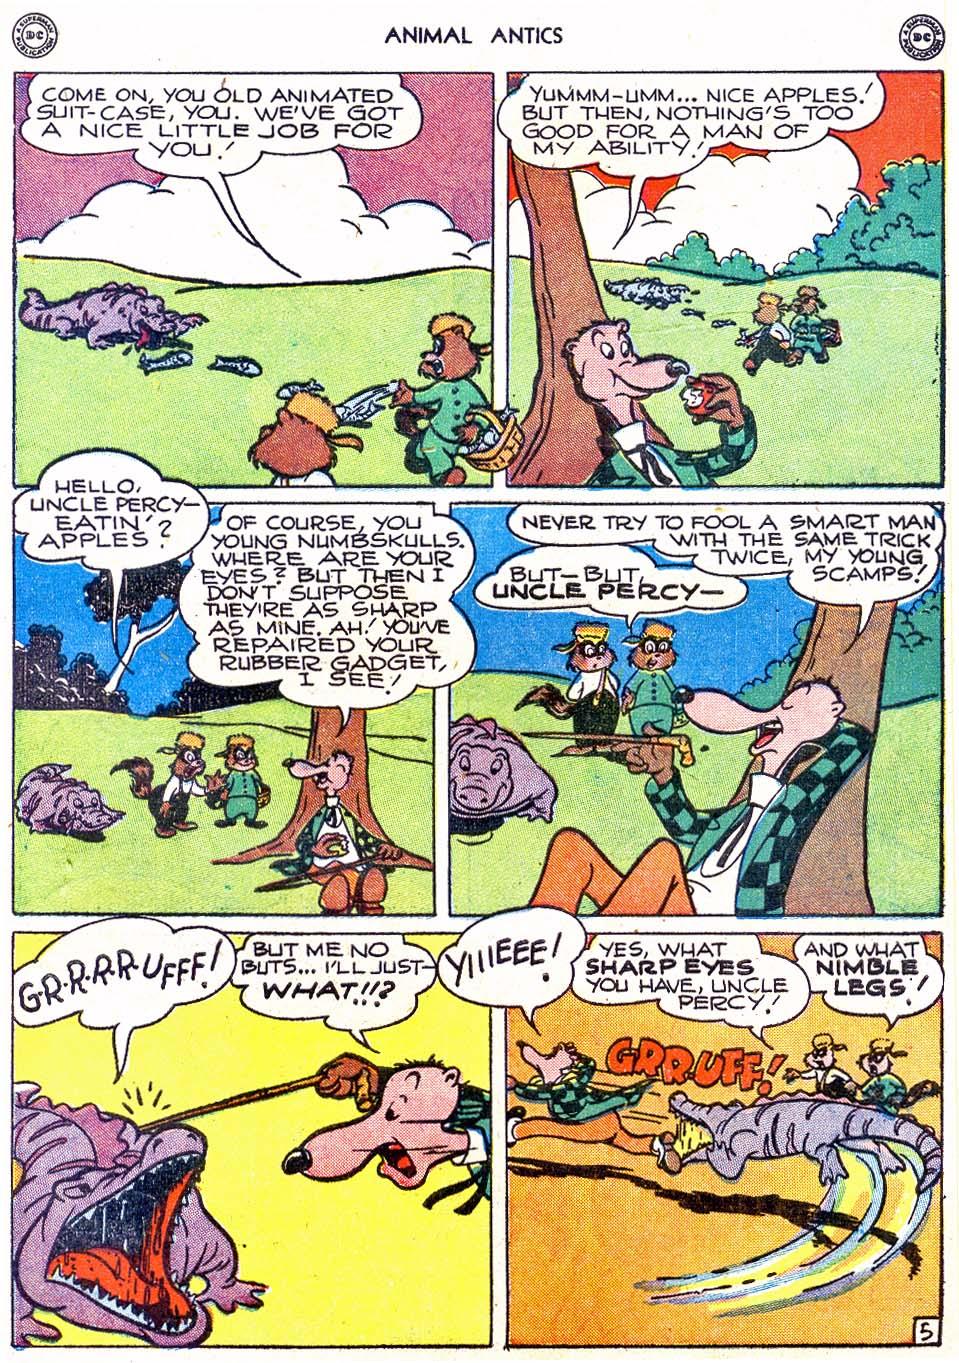 Read online Animal Antics comic -  Issue #4 - 49